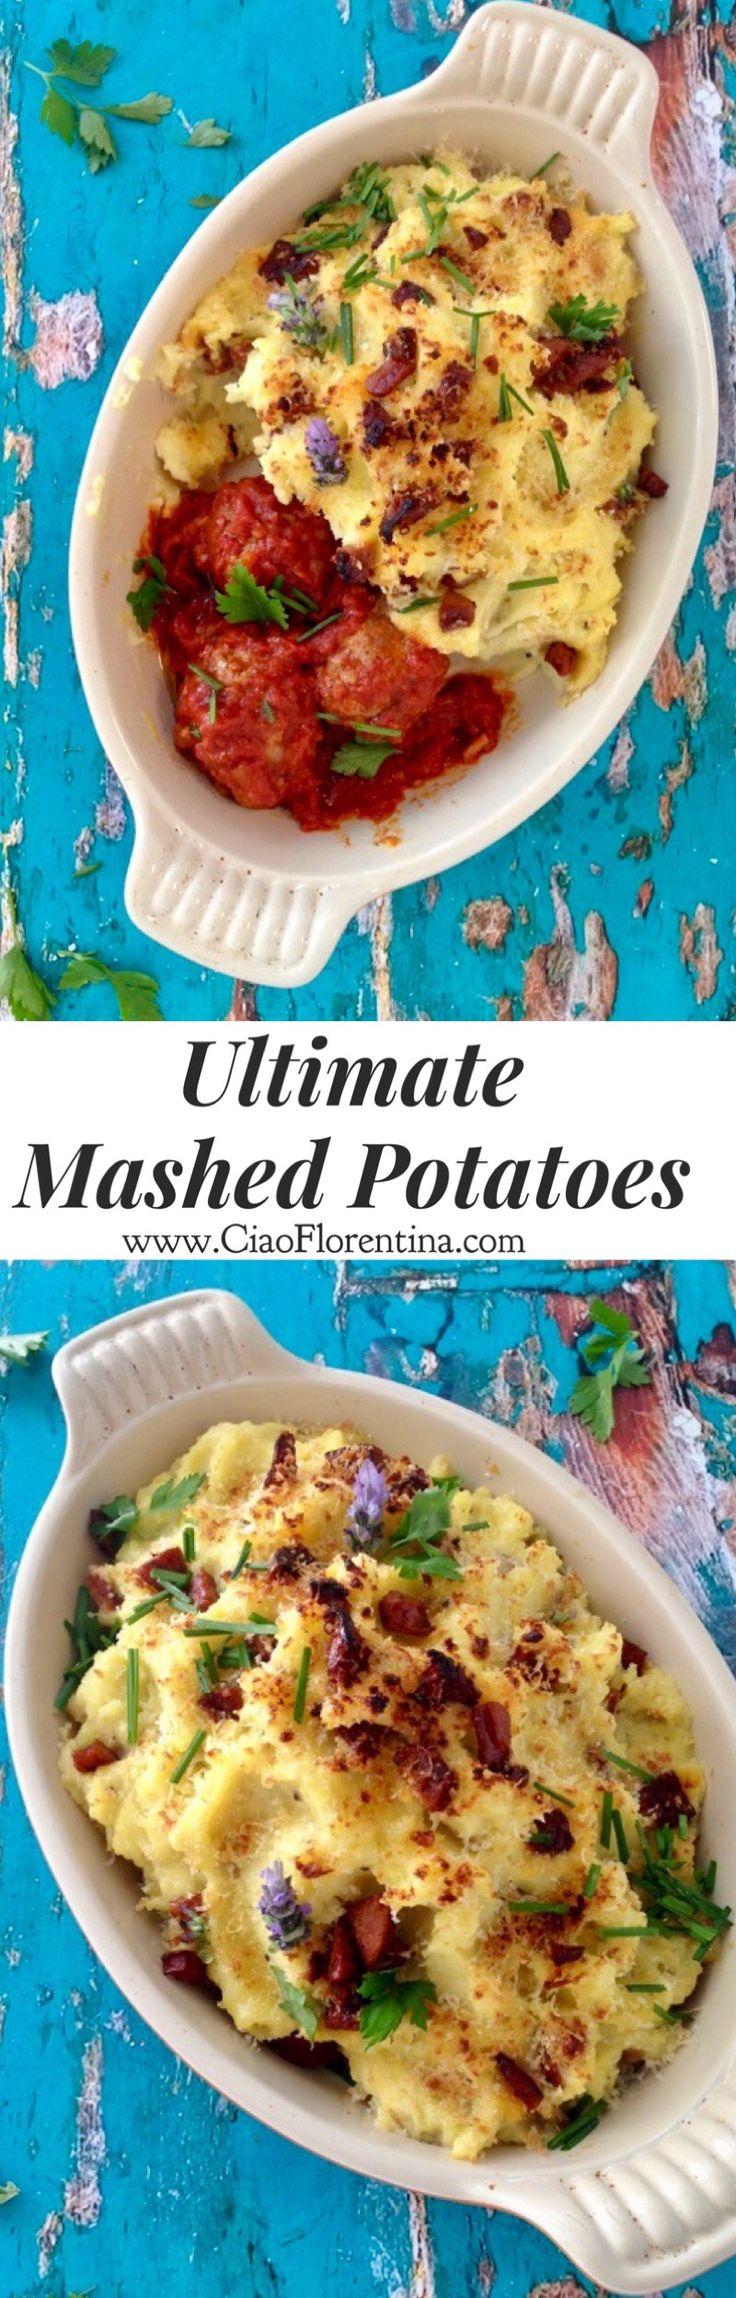 Ultimate Mashed Potato Recipe with Sour Cream, Butter, Garlic and Andouille | CiaoFlorentina.com @CiaoFlorentina #mashedpotatoes #sides